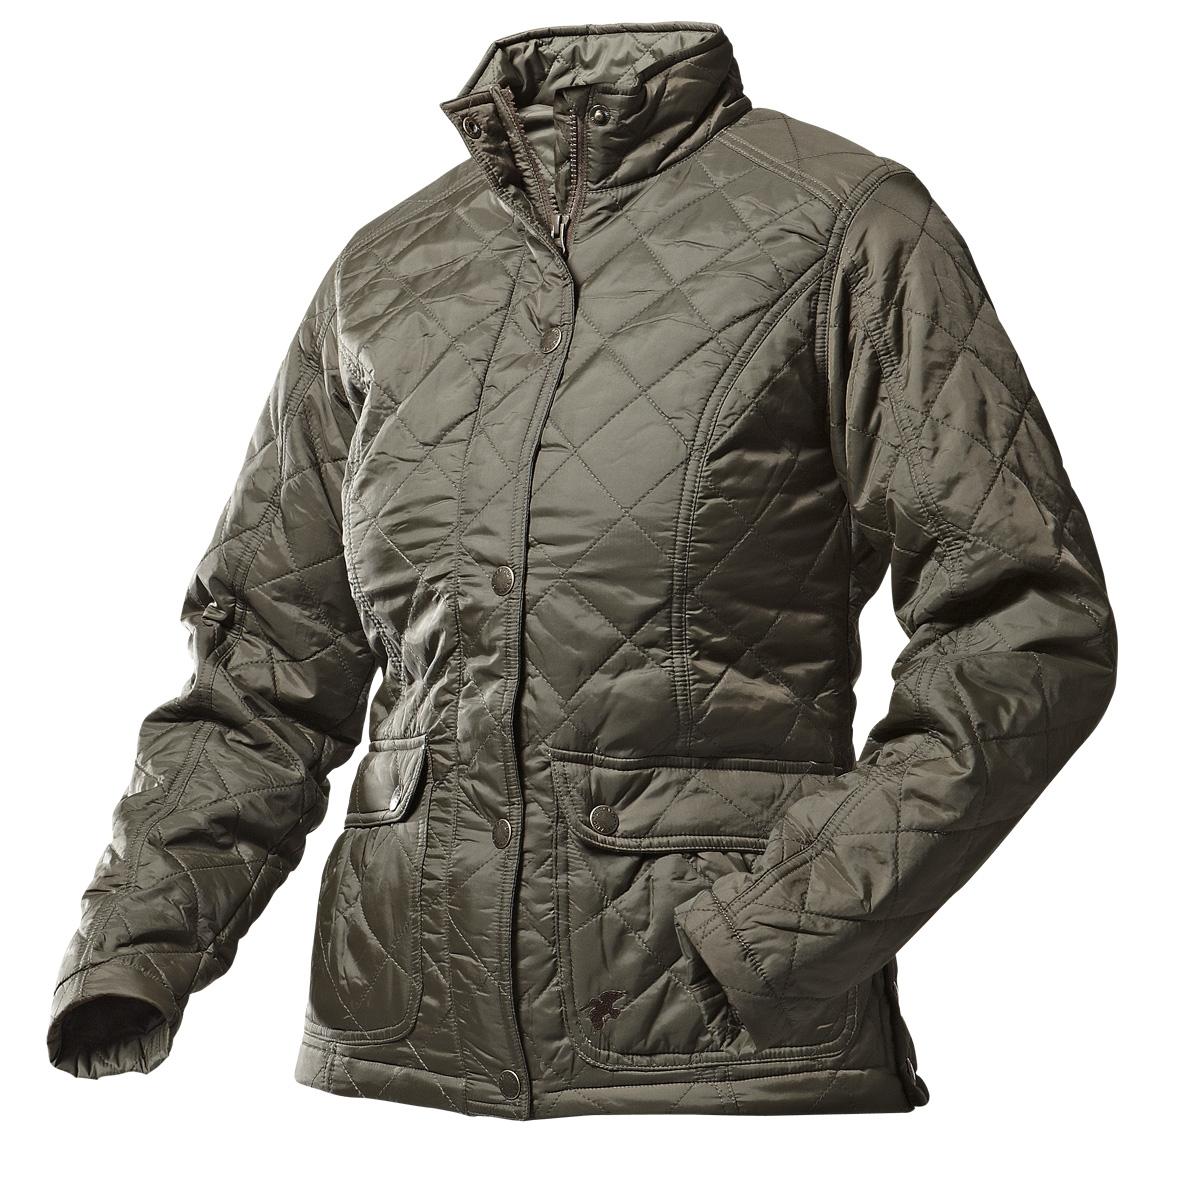 2a8a738f367 Seeland Cottage Quilt Lady Jacket - Black Olive | Uttings.co.uk